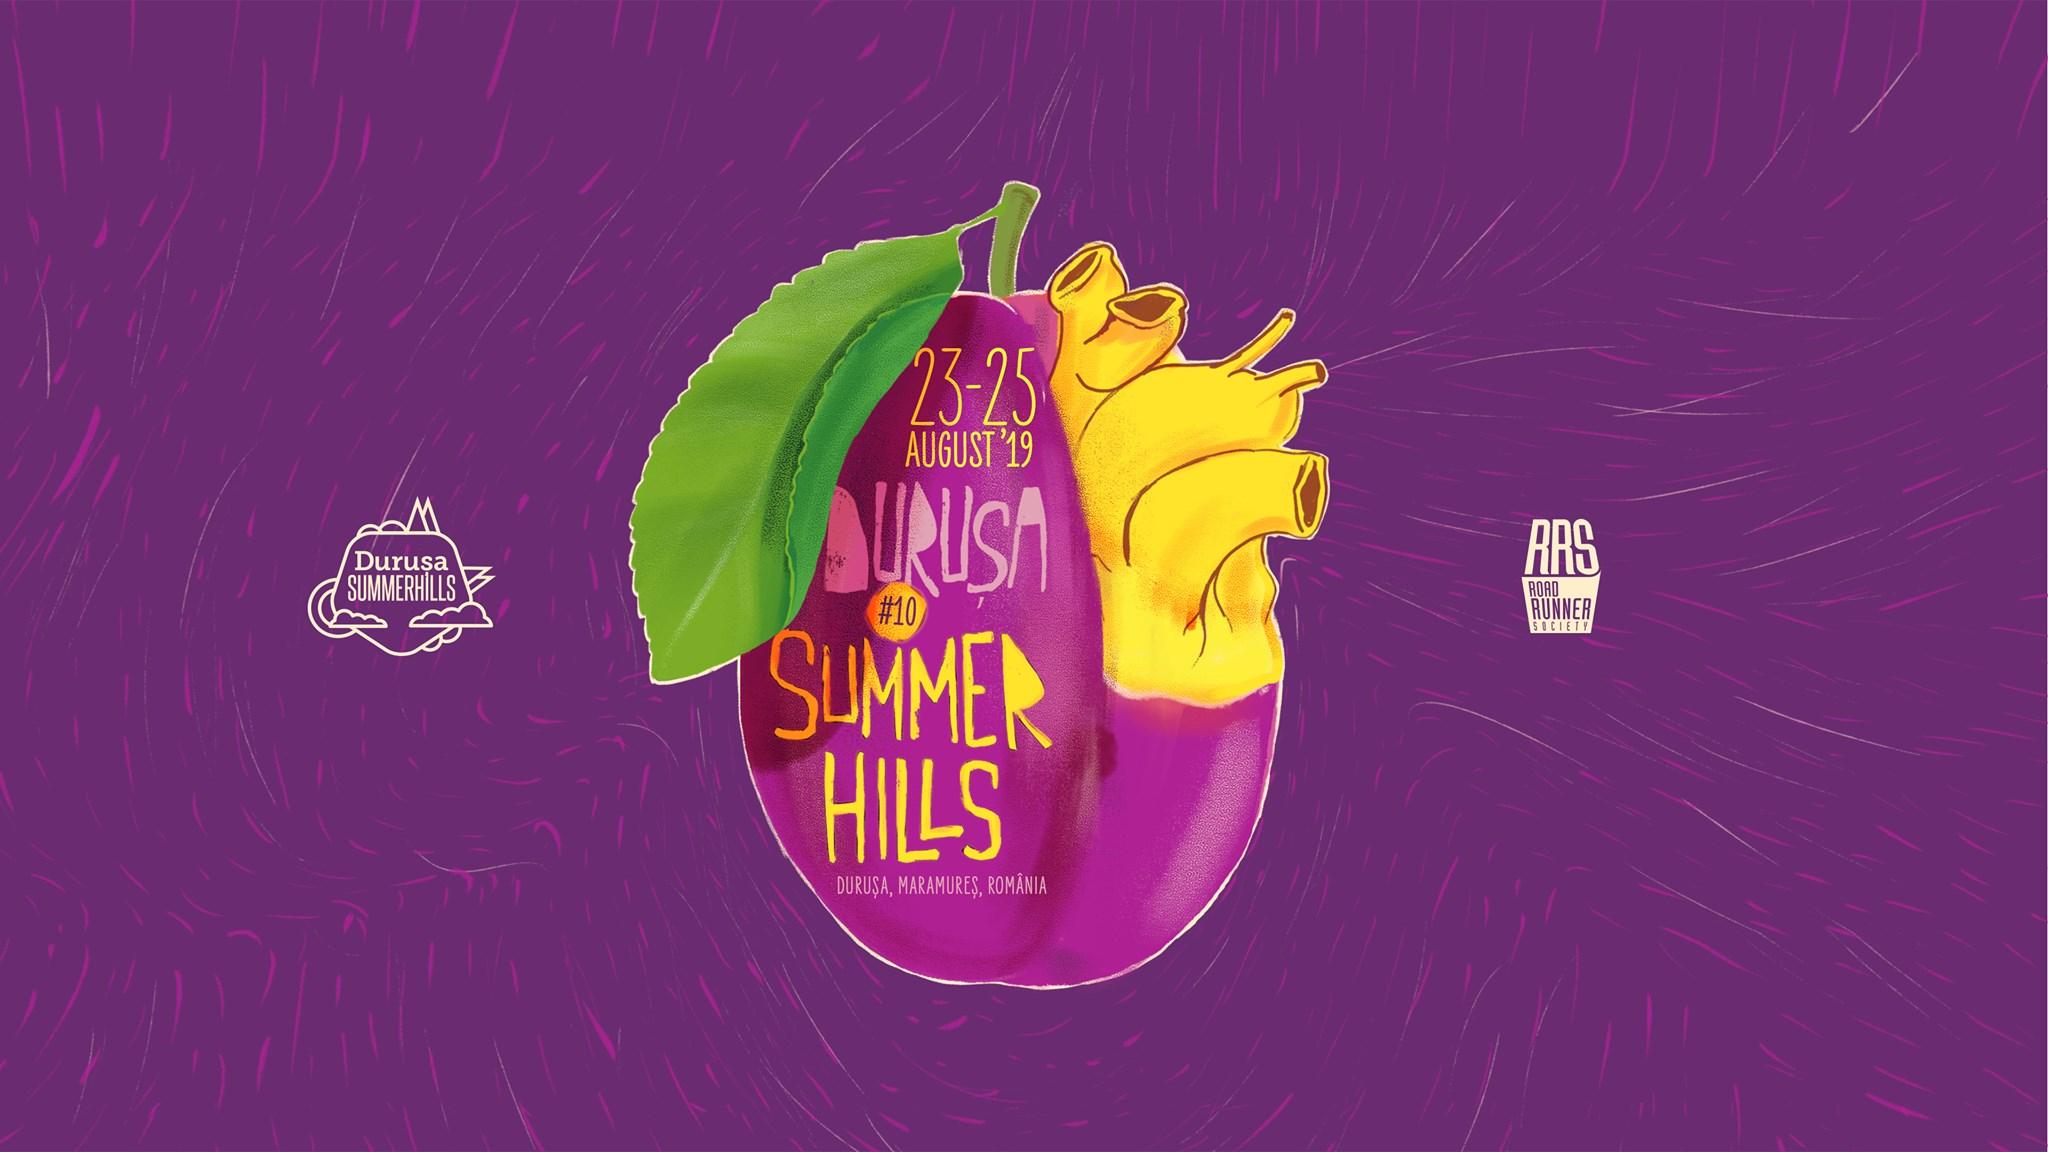 10 ani de Durușa Summer Hills